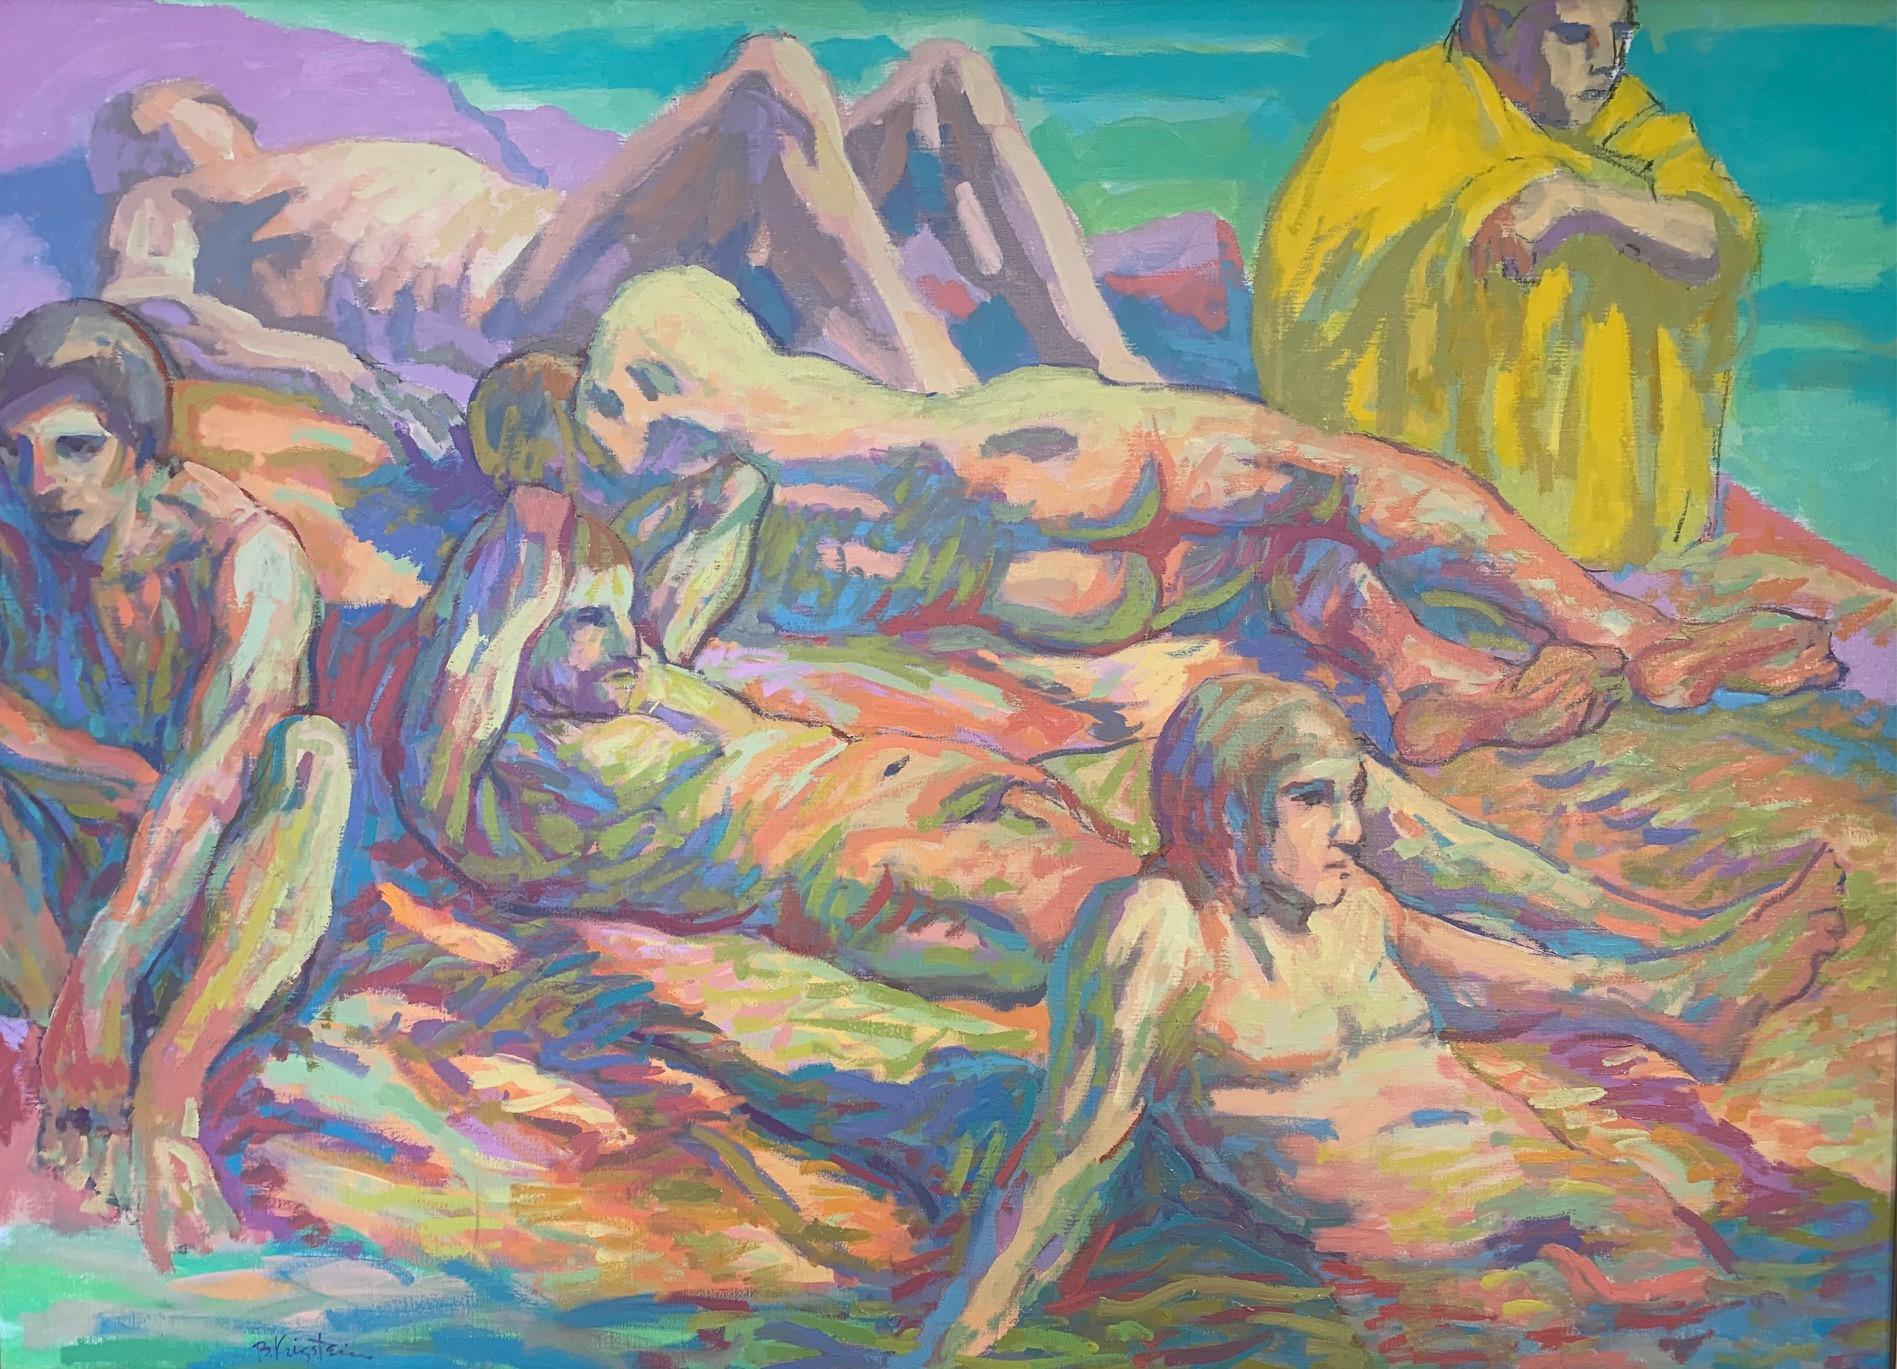 """Ausable River Bathers"" Oil On Canvas 55"" x 41"" Framed By Bernard Krigstein"